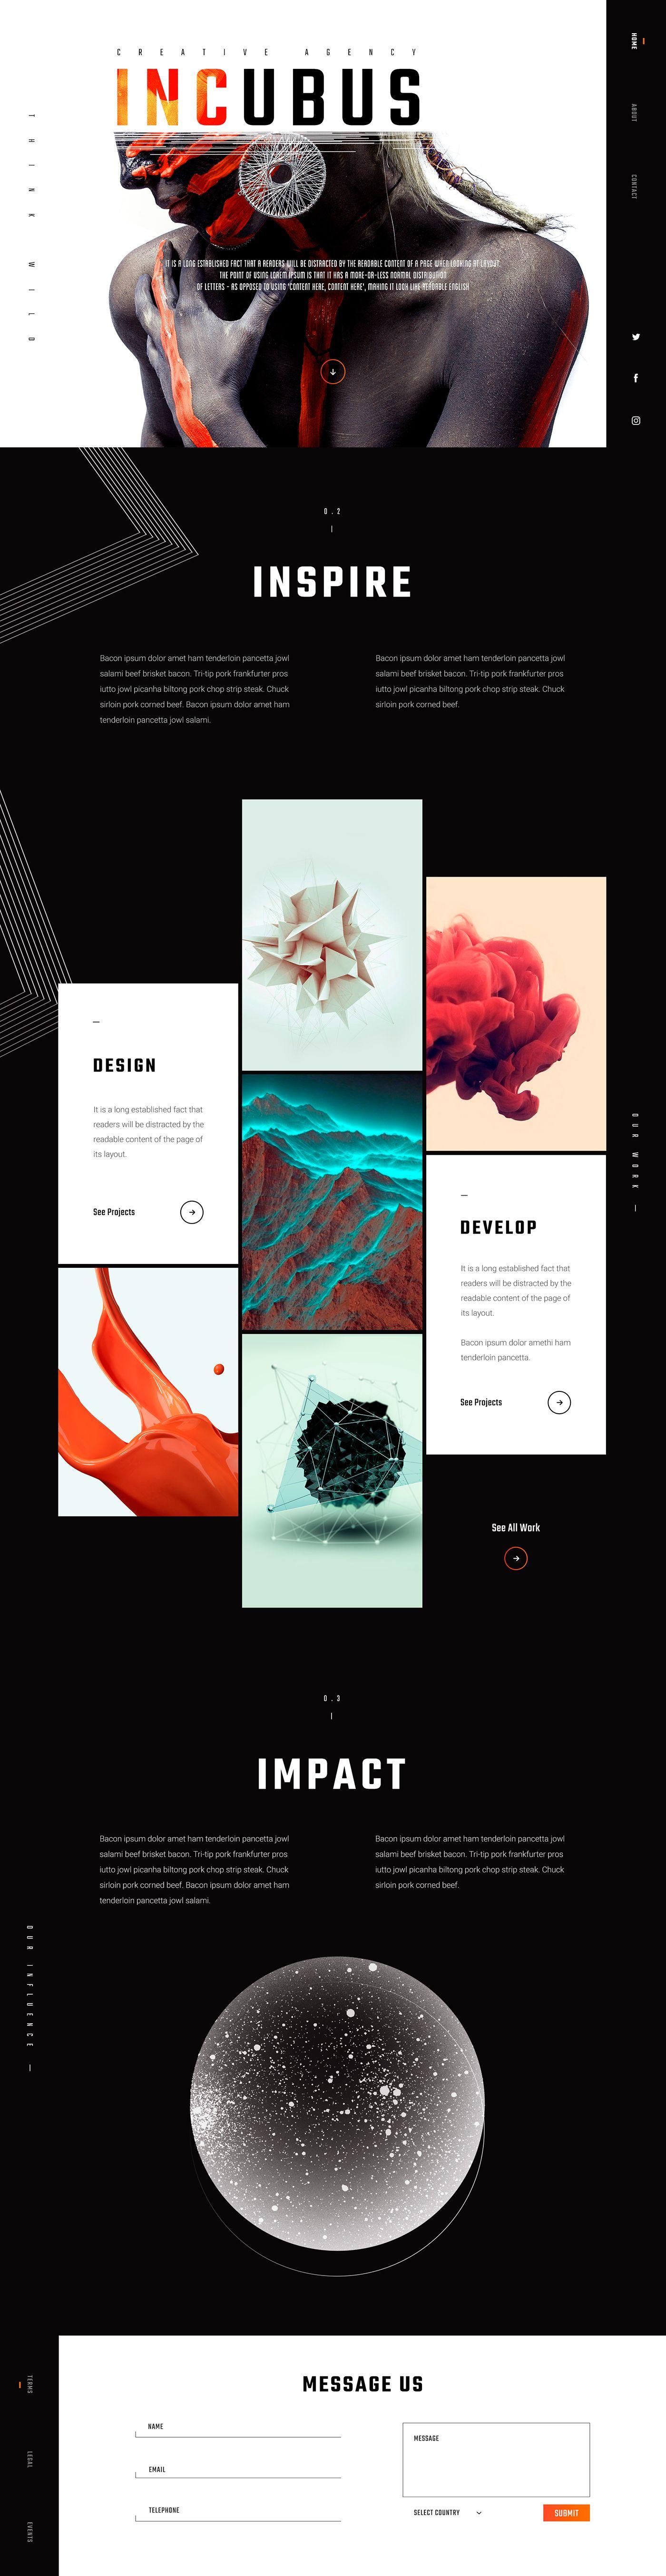 Incubus Creative Agency Portfolio Website On Behance Web Design Webdesign Design